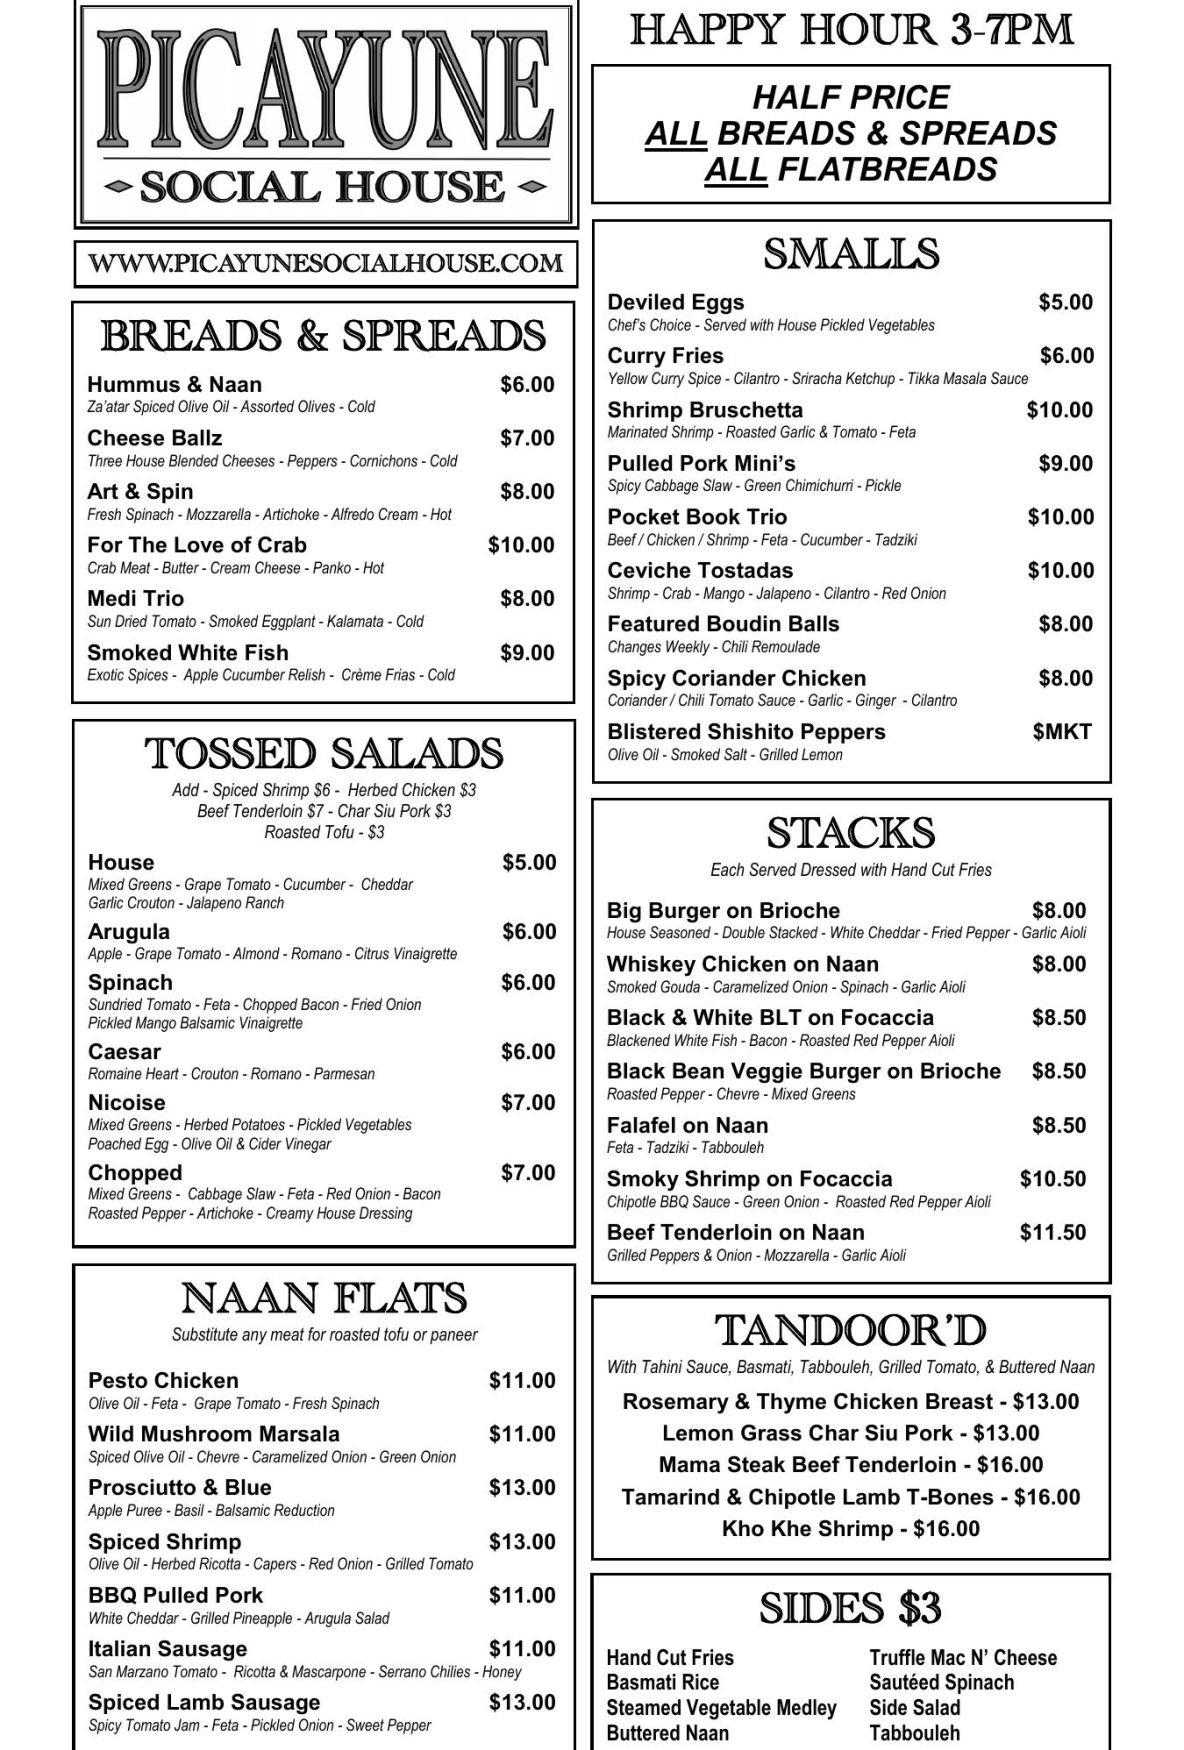 Picayune Social House menu